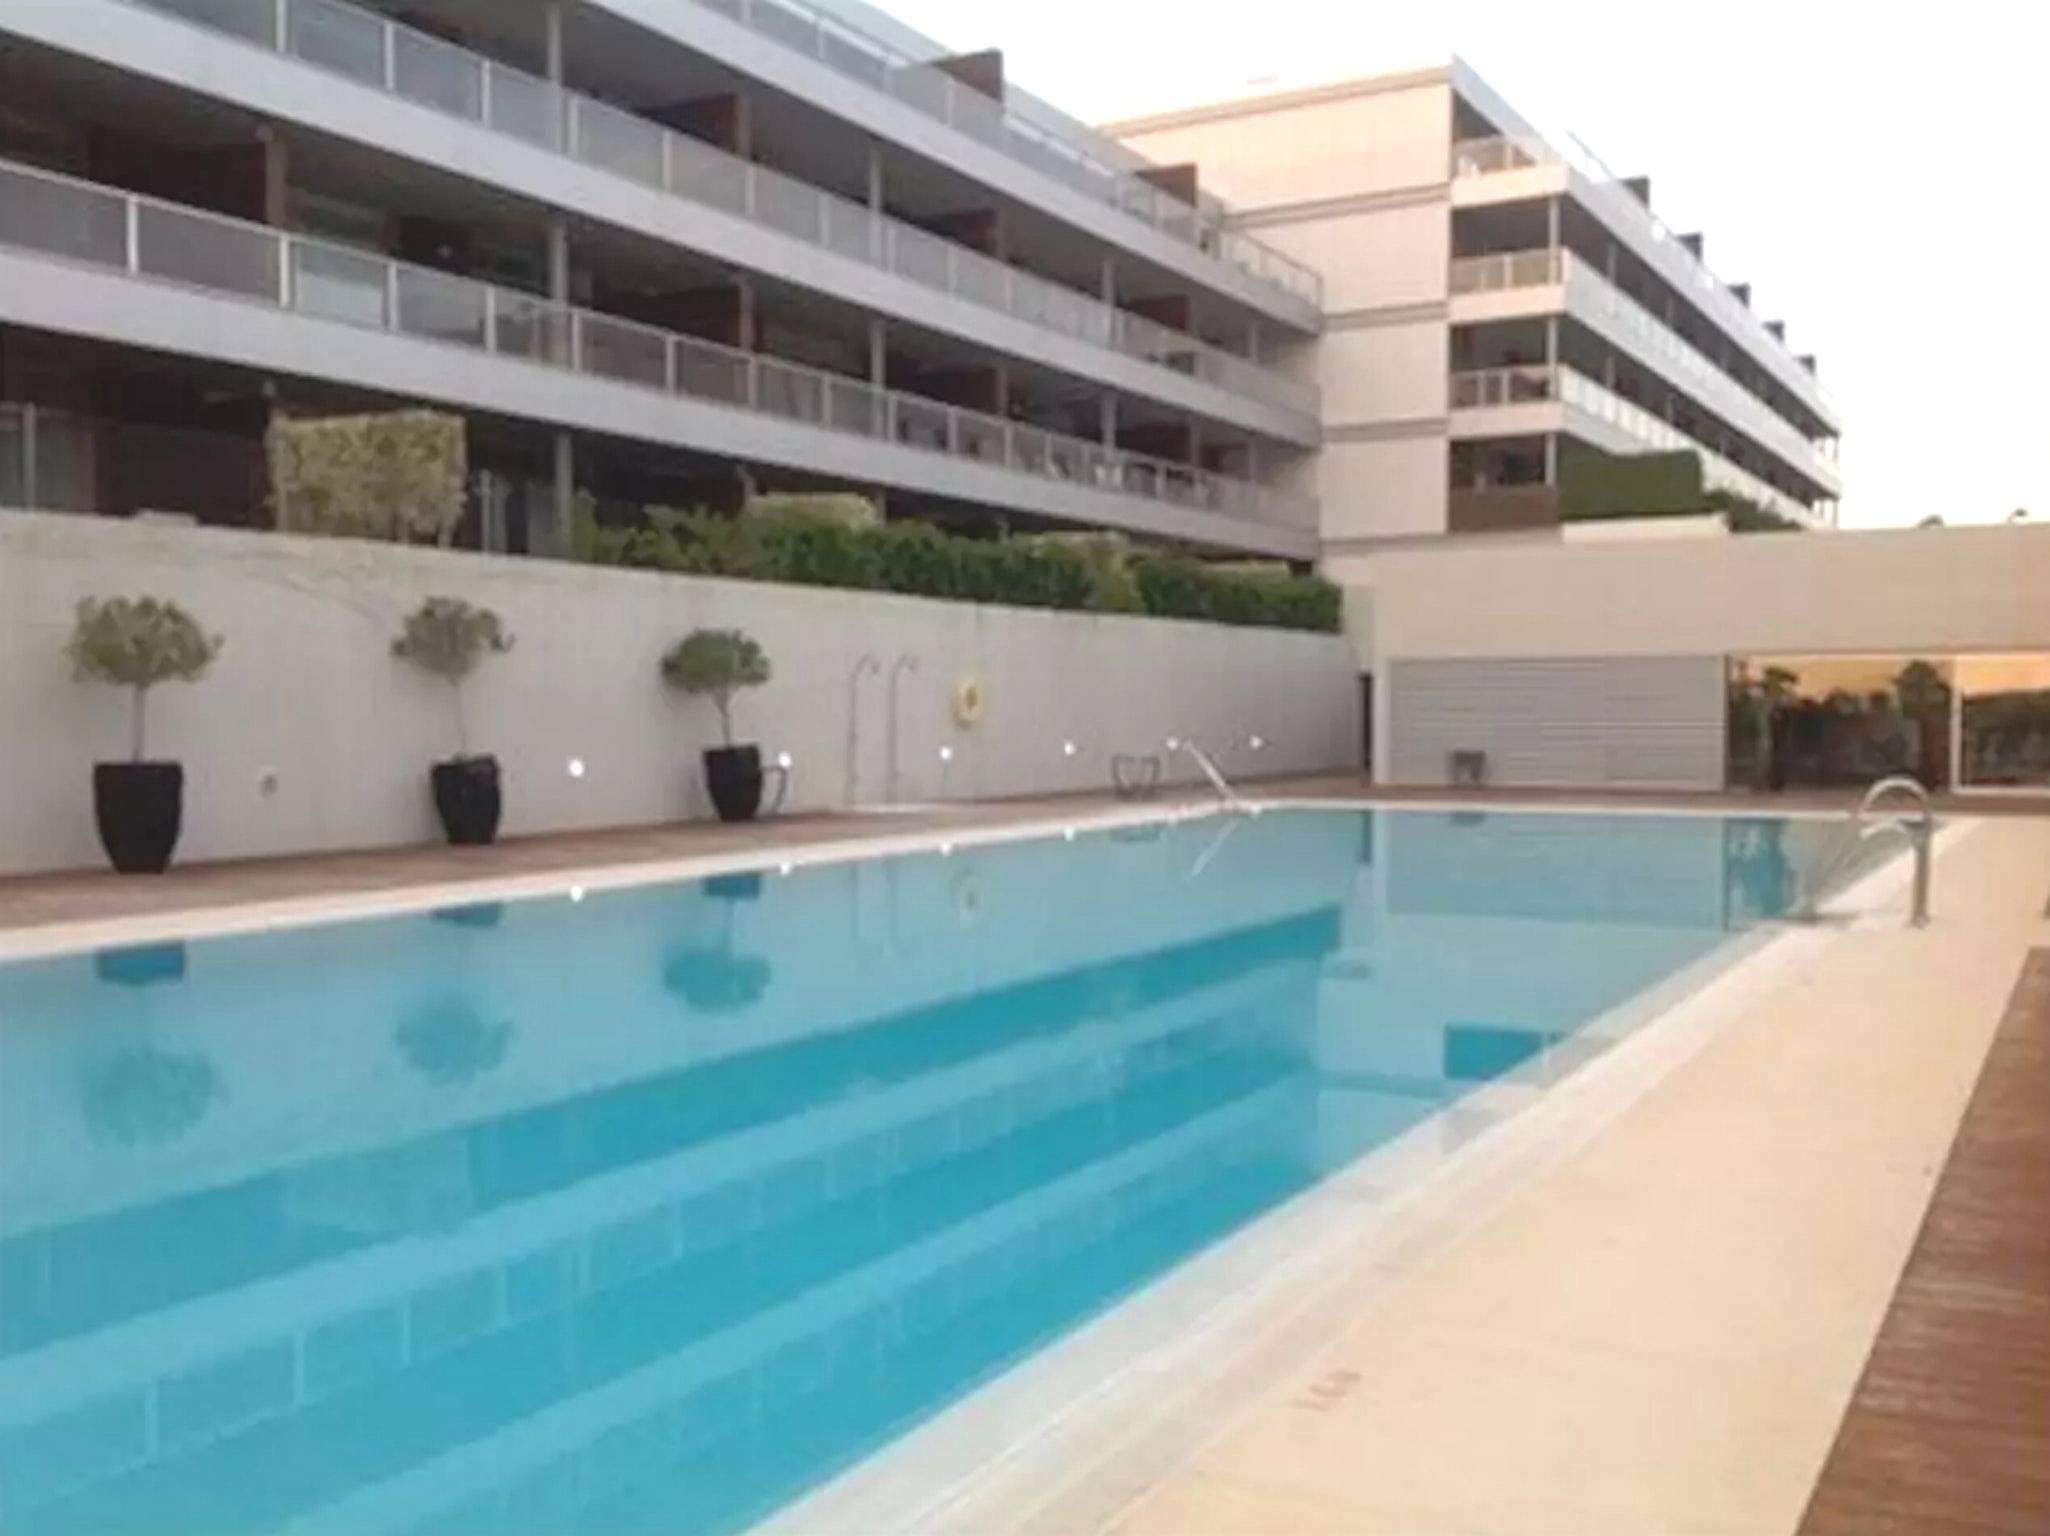 Apartamentos san diego san roque alquiler apartamentos for Pisos alquiler san roque